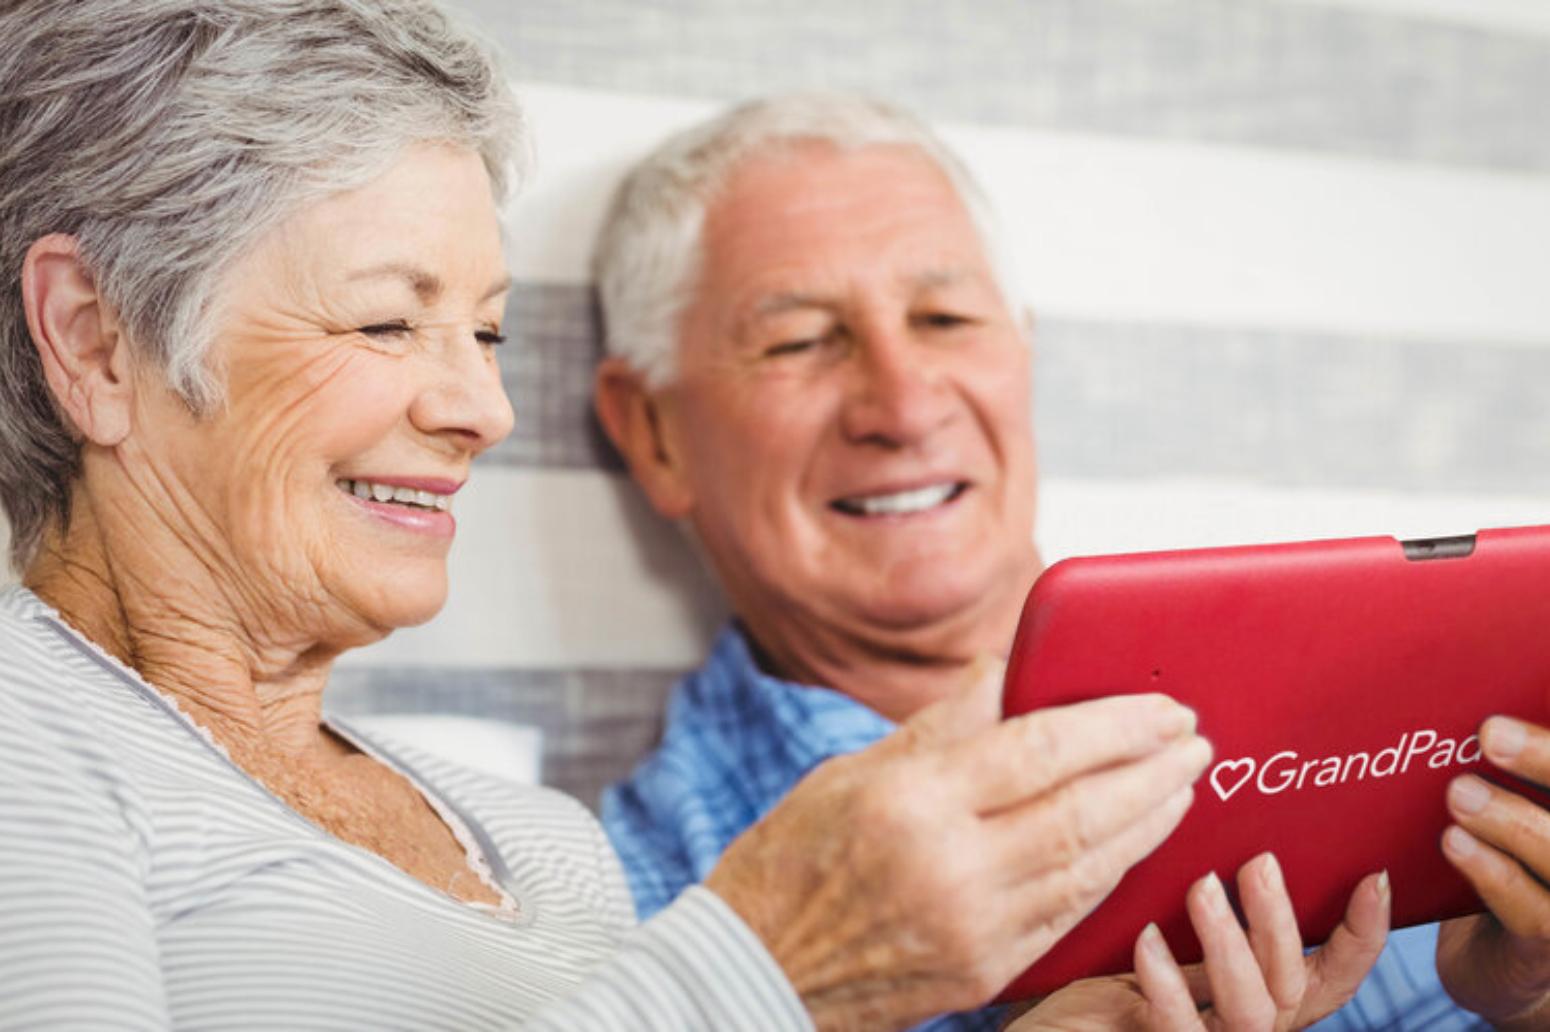 Senior couple enjoying a grandpad video call